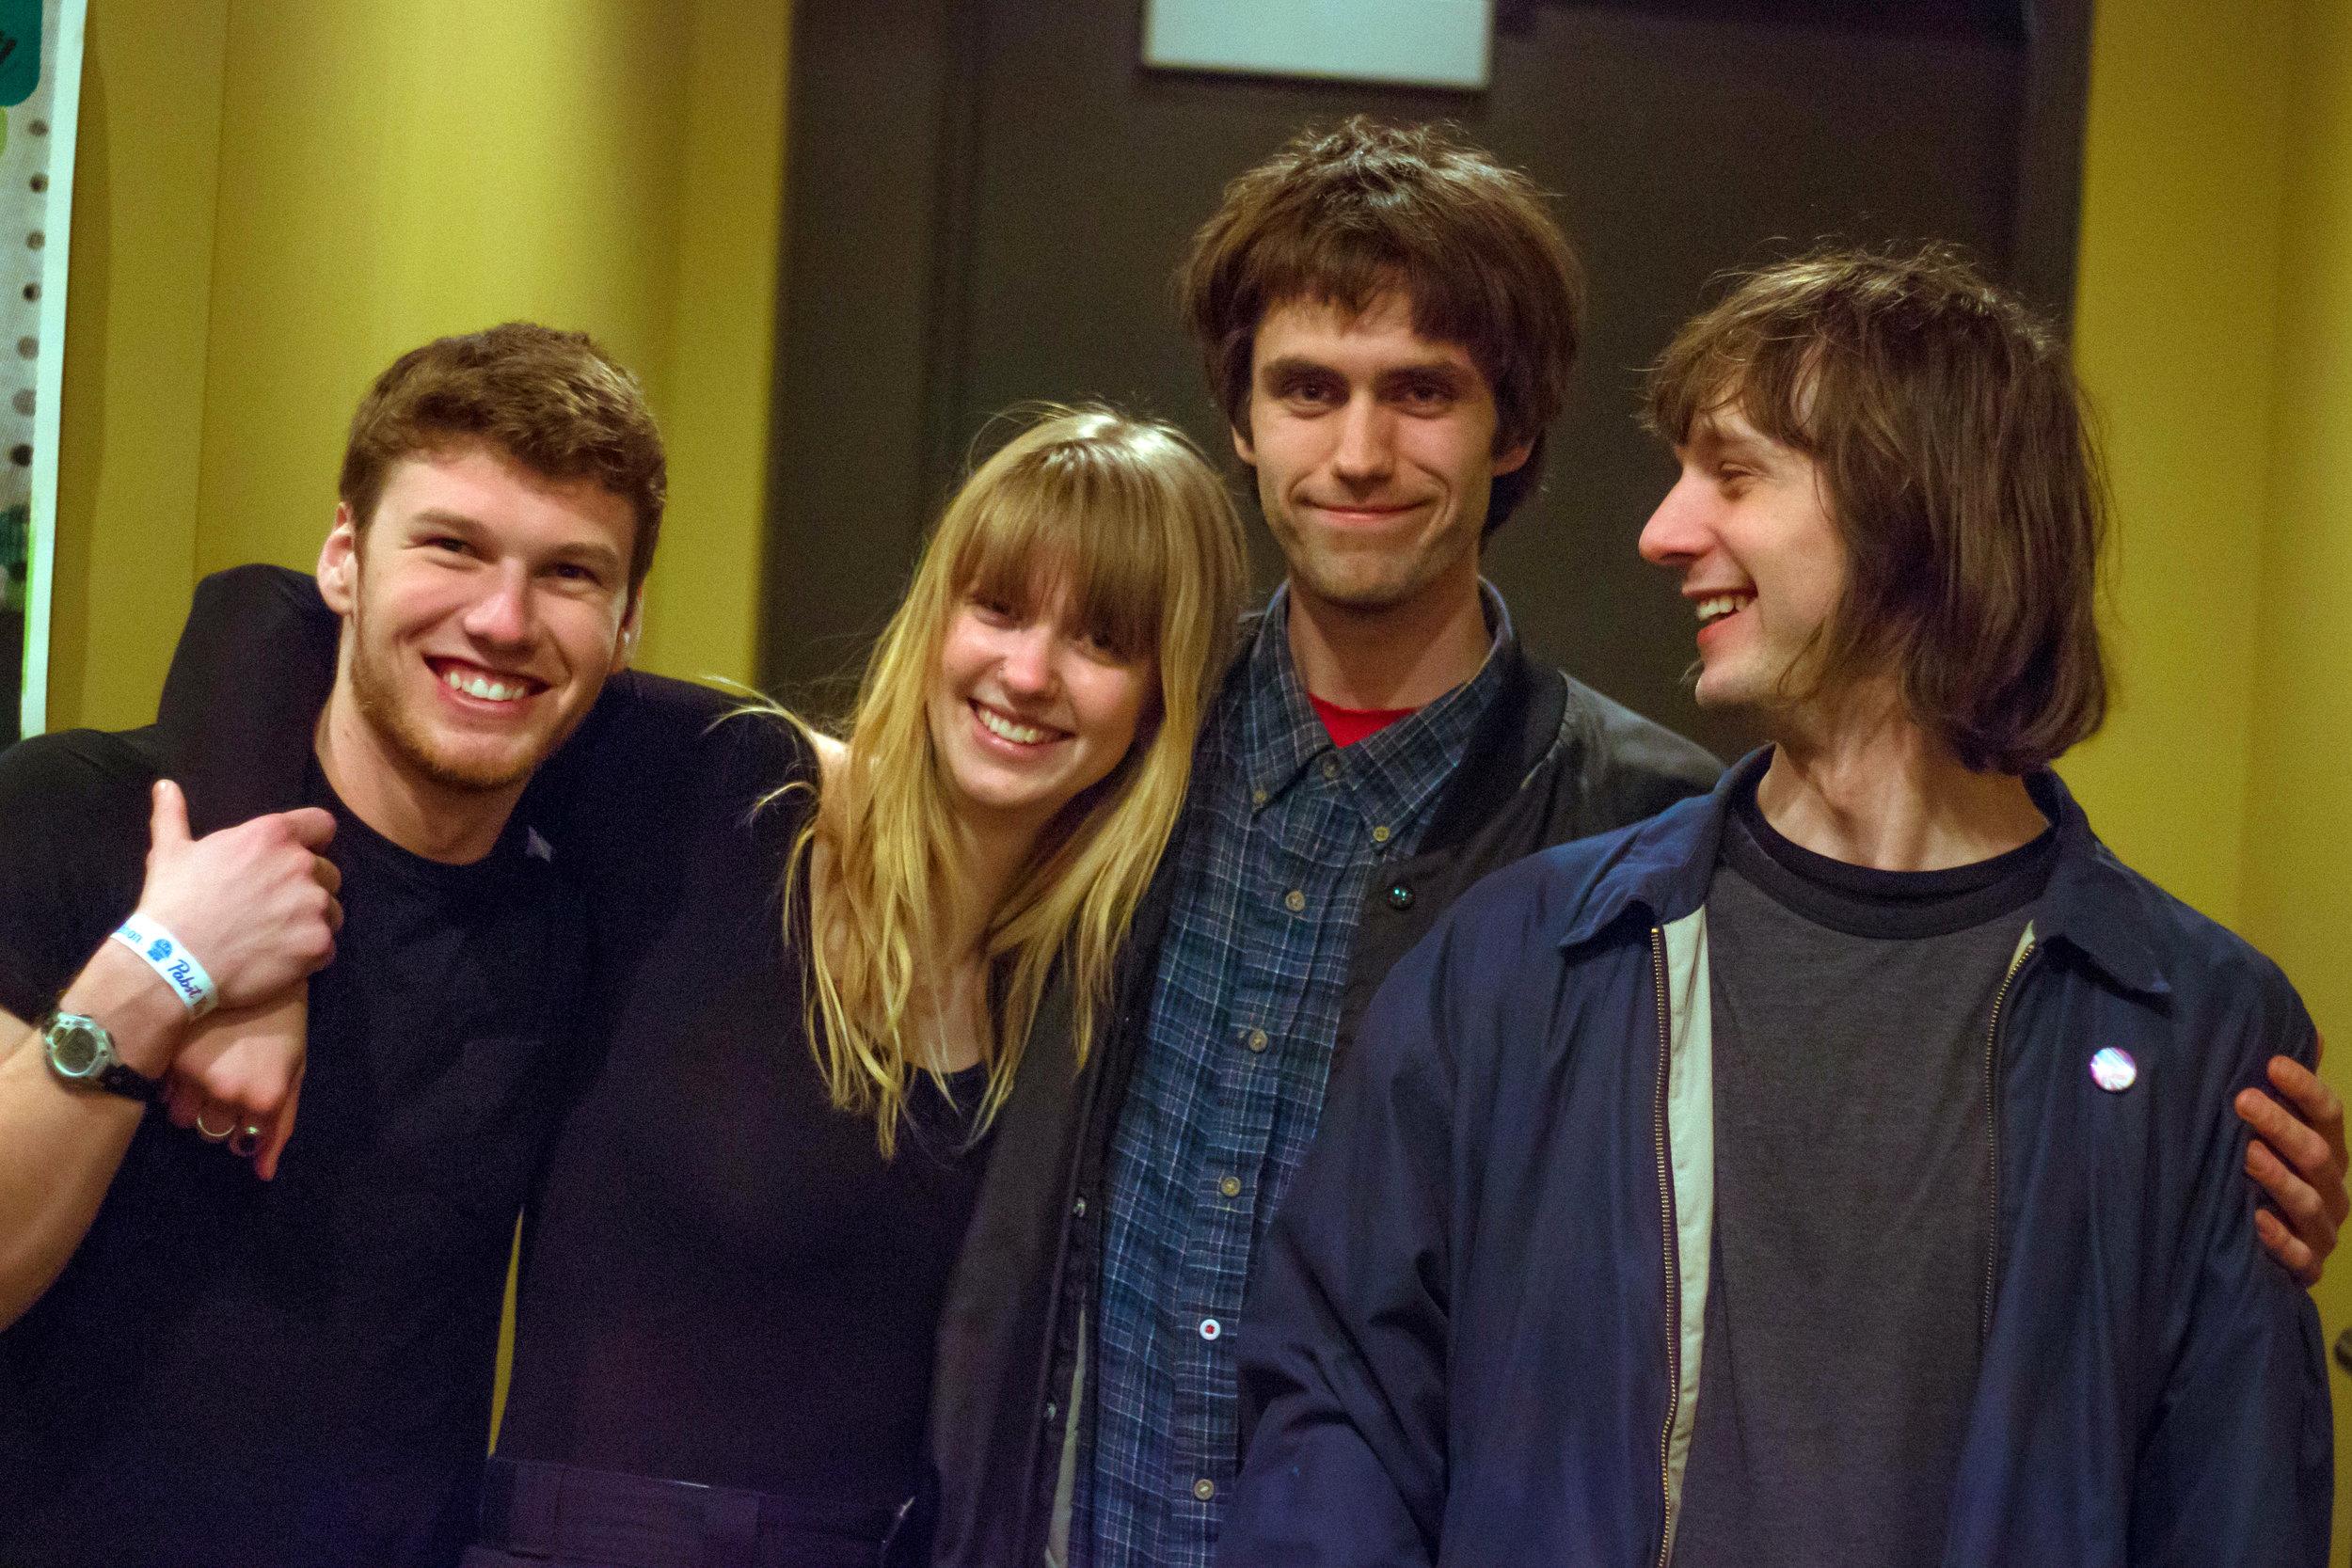 Slow Pulp is Teddy Matthews, Emily Massey, Henry Stoehr, and Alex Leeds